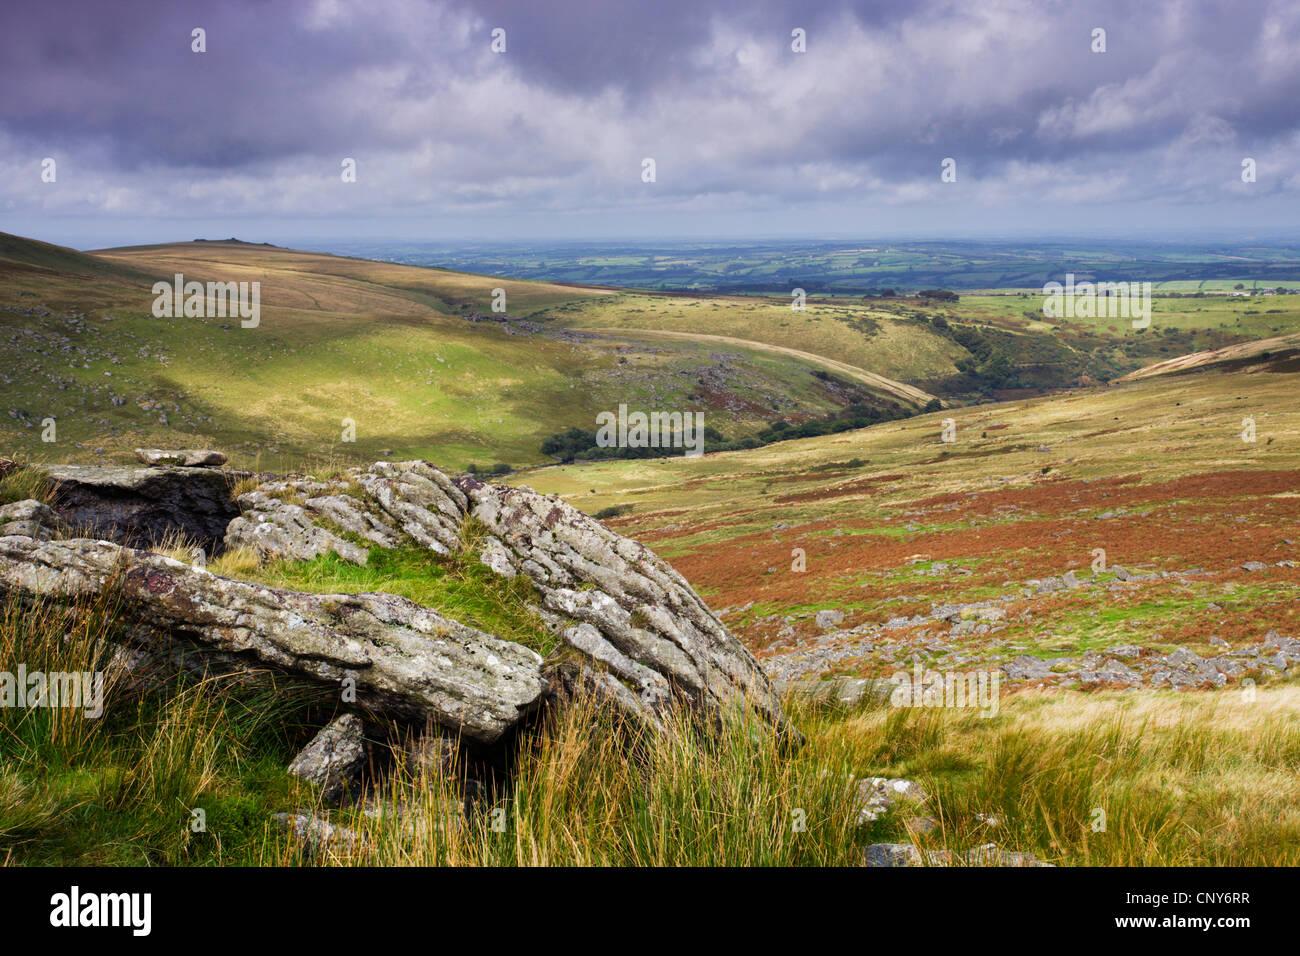 Homerton Hill in Northwest Dartmoor, viewed from Black Tor, Devon, England - Stock Image